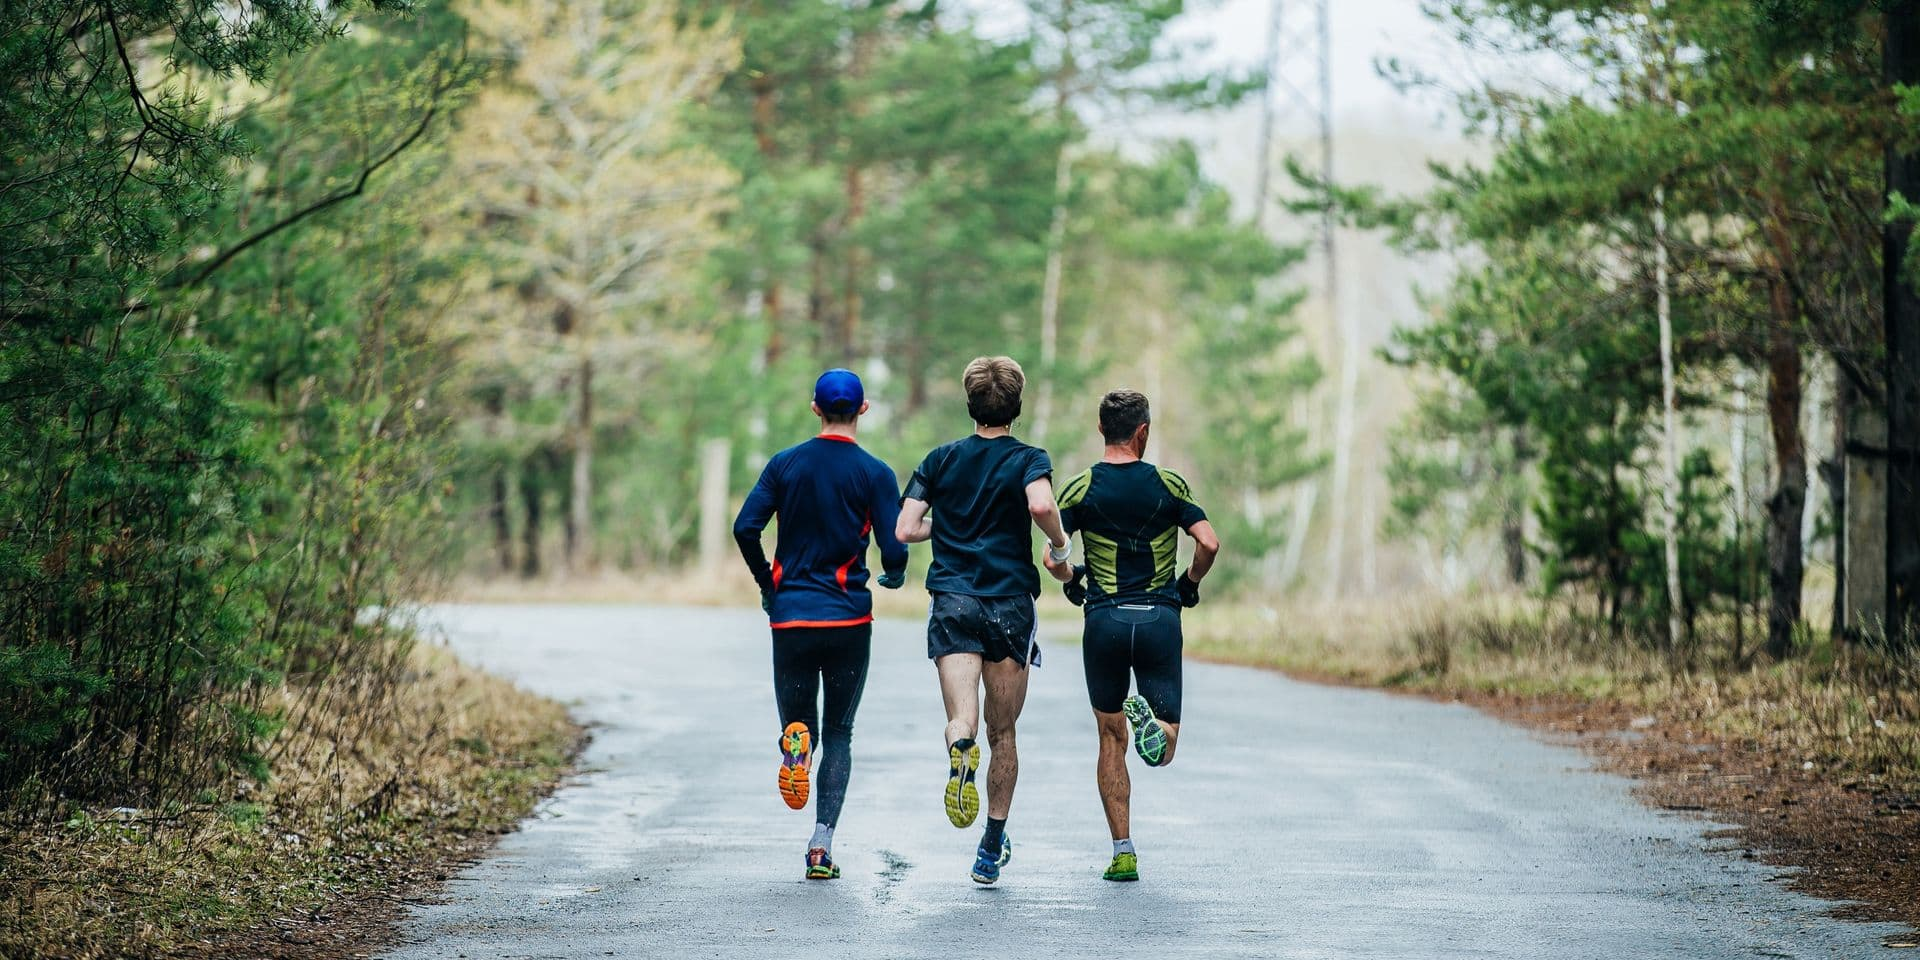 General,Plan,Runners,Three,Men,Running,Down,Road,In,Park.